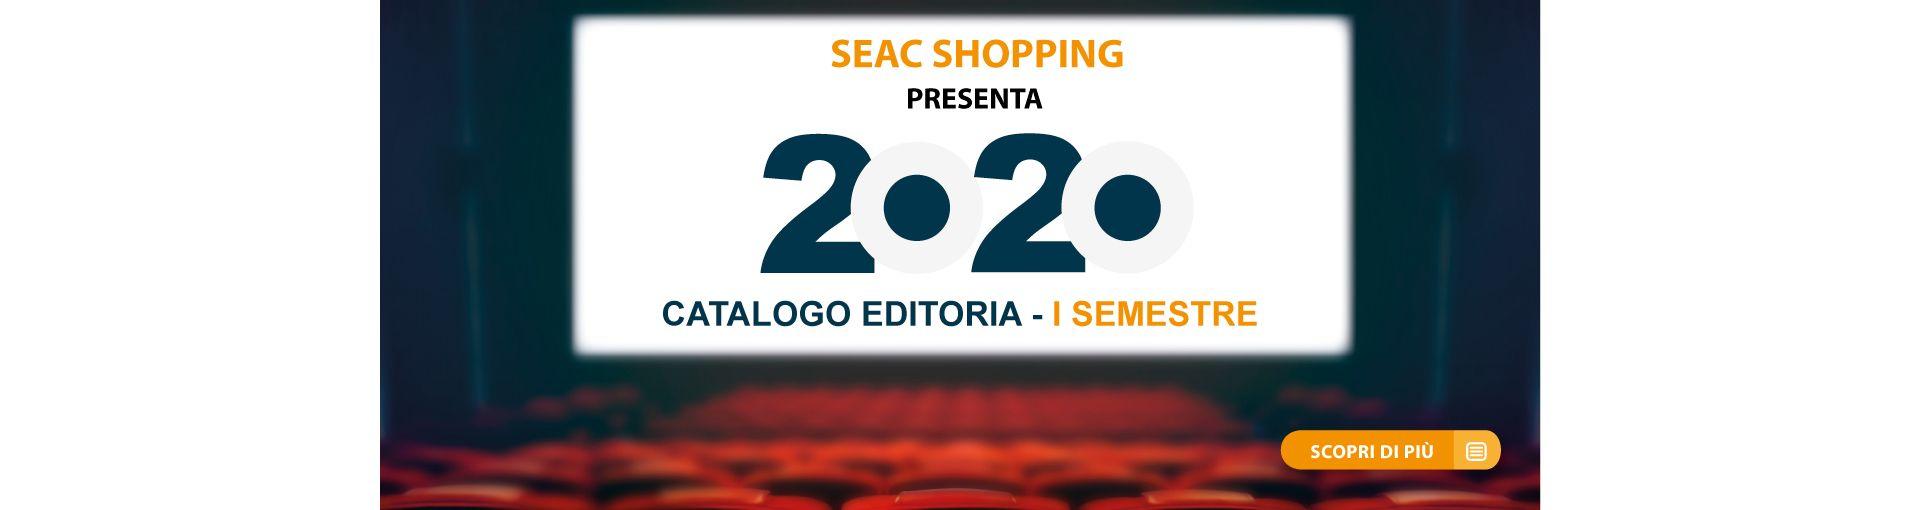 Catalogo editoria 2020